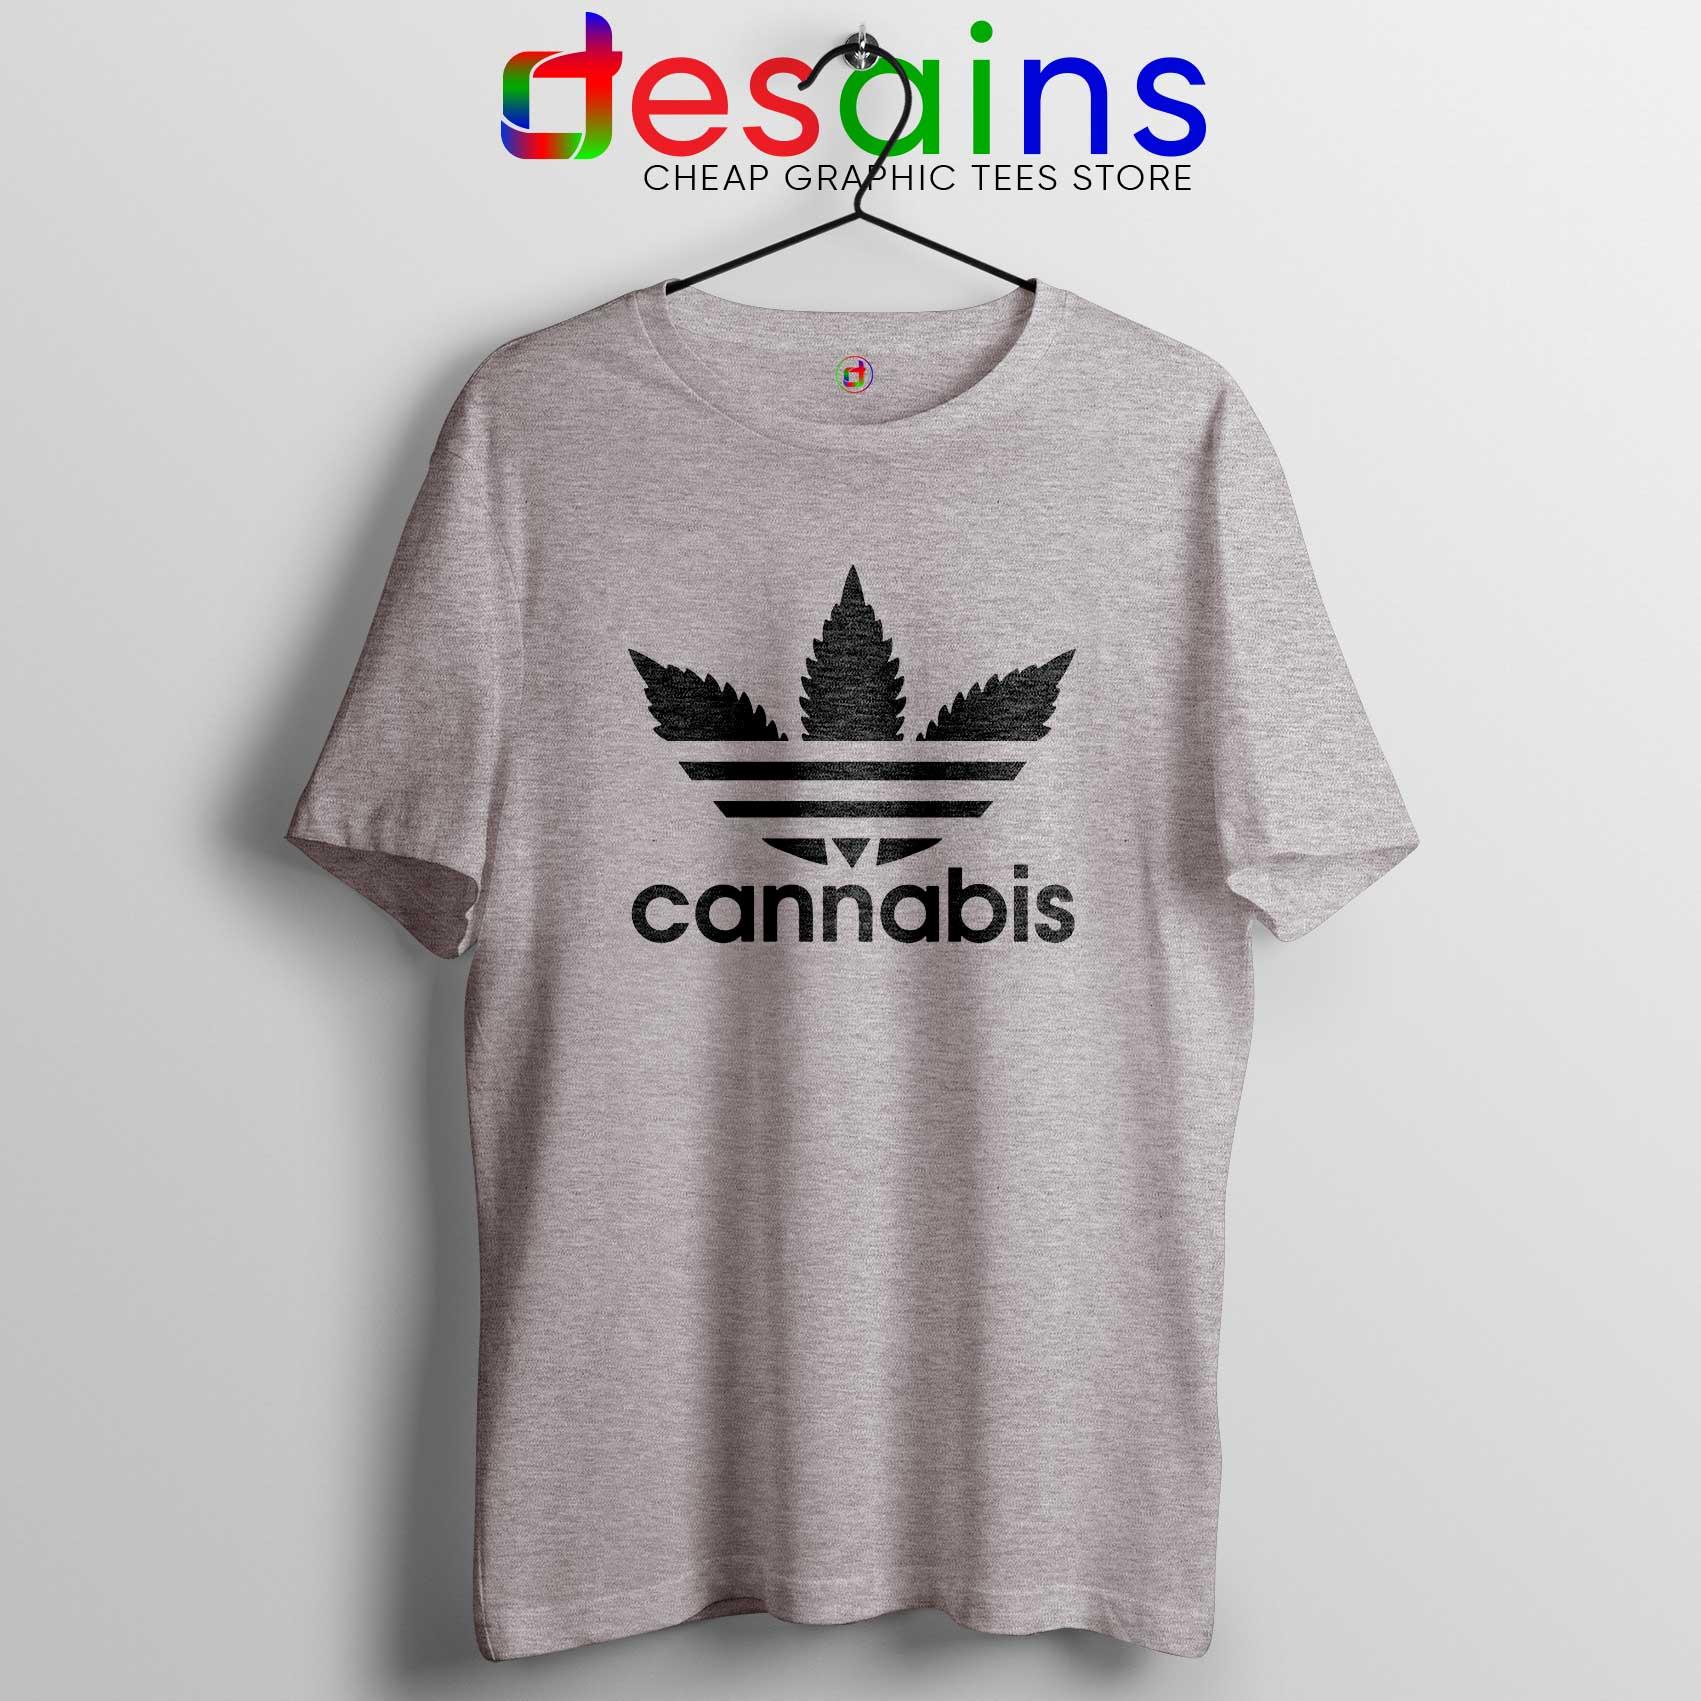 Tee Shirt Cannabis Leaf Adidas Cheap Tshirt Adidas Parody S 3XL